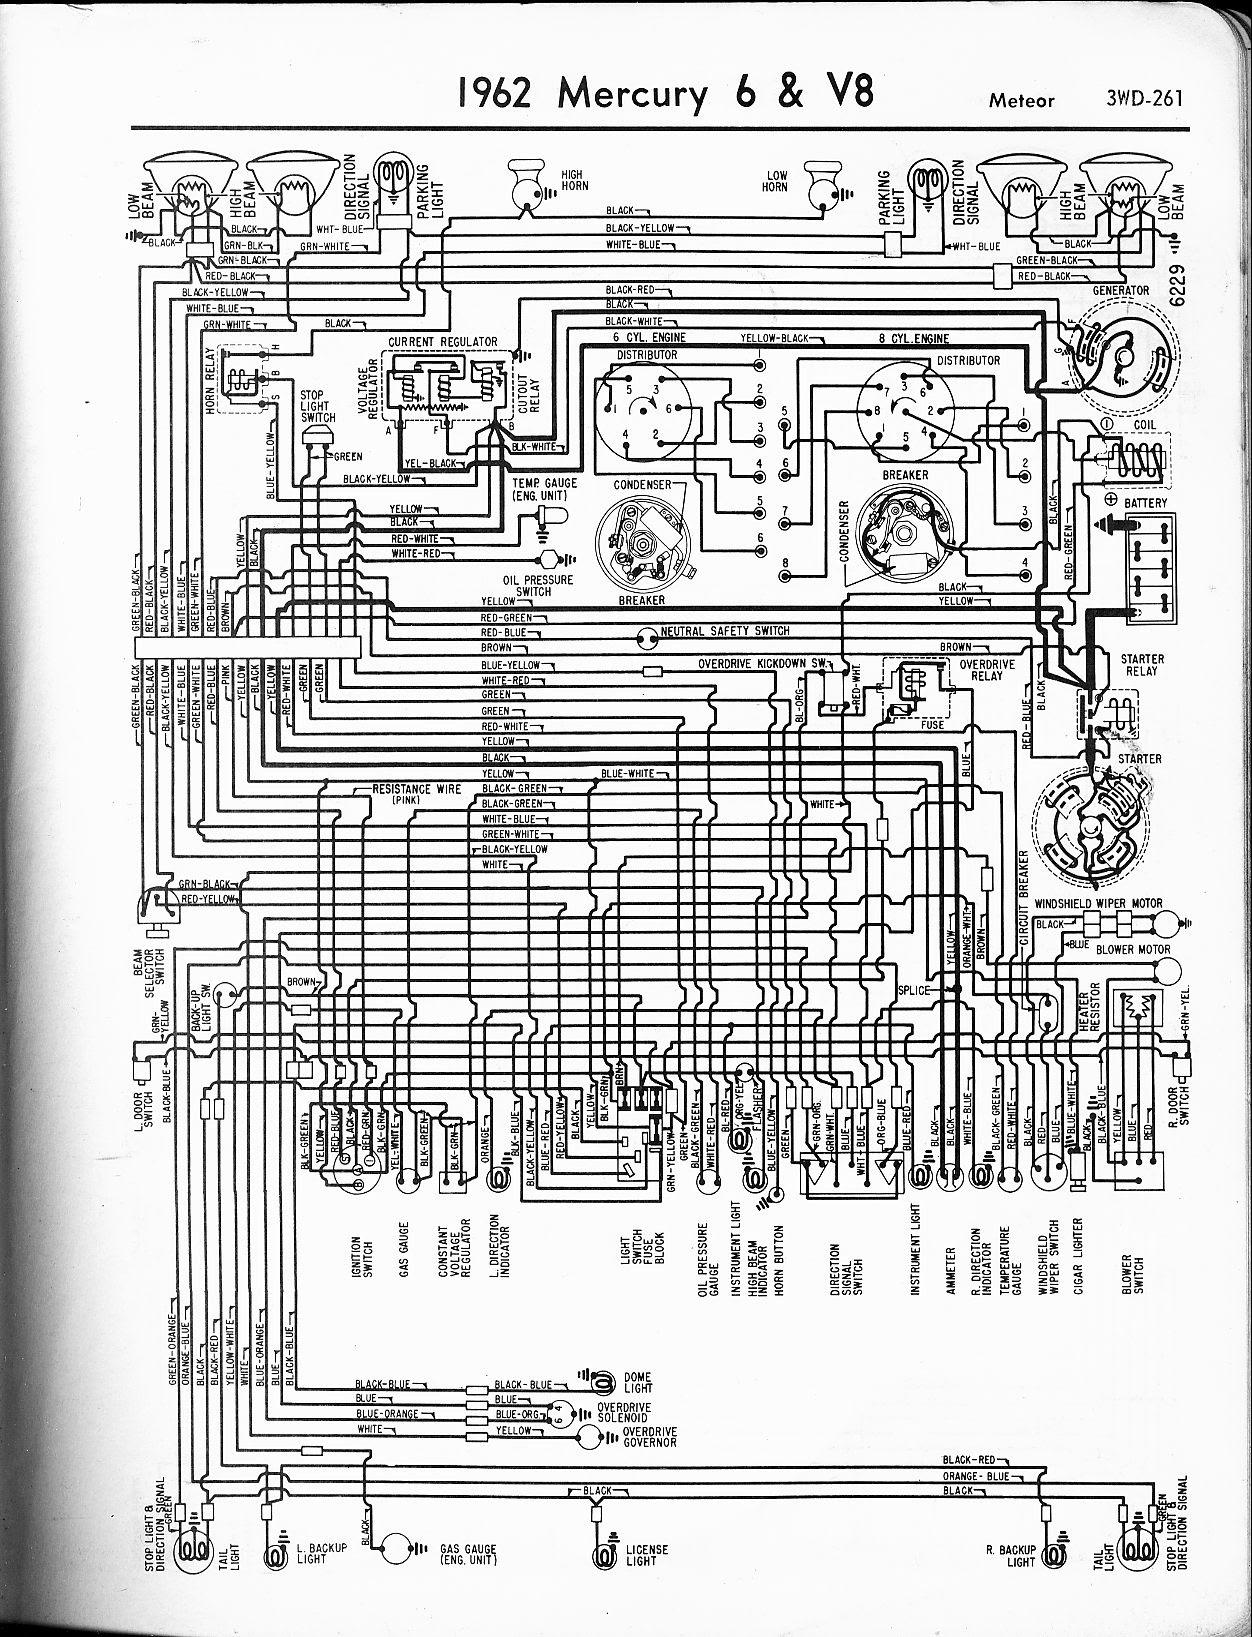 18+ 1969 Mercury Wire Diagrams Images